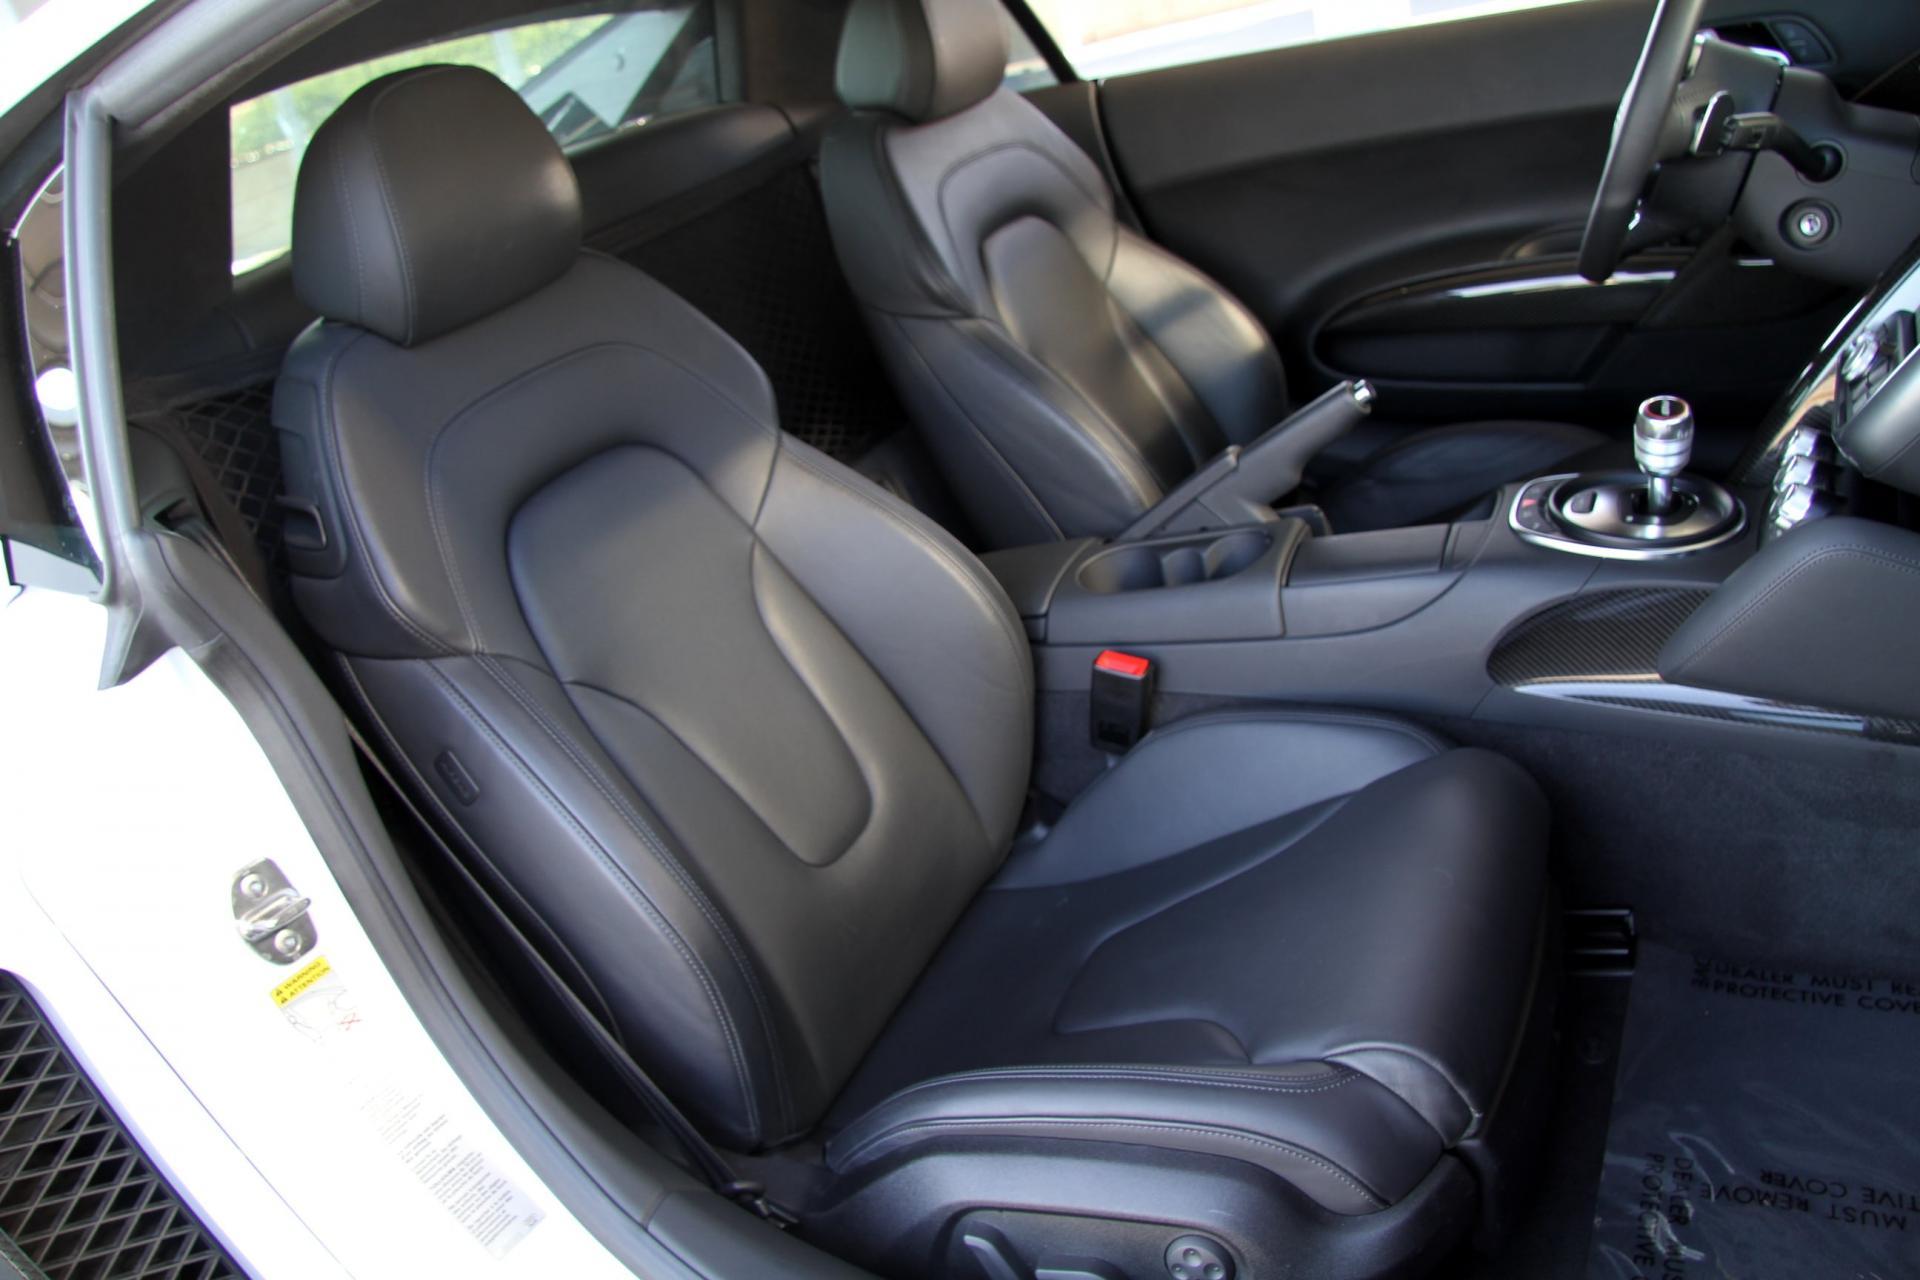 2010 Audi R8 V-10 5.2 Stock # 5977 for sale near Redondo Beach, CA | CA Audi Dealer